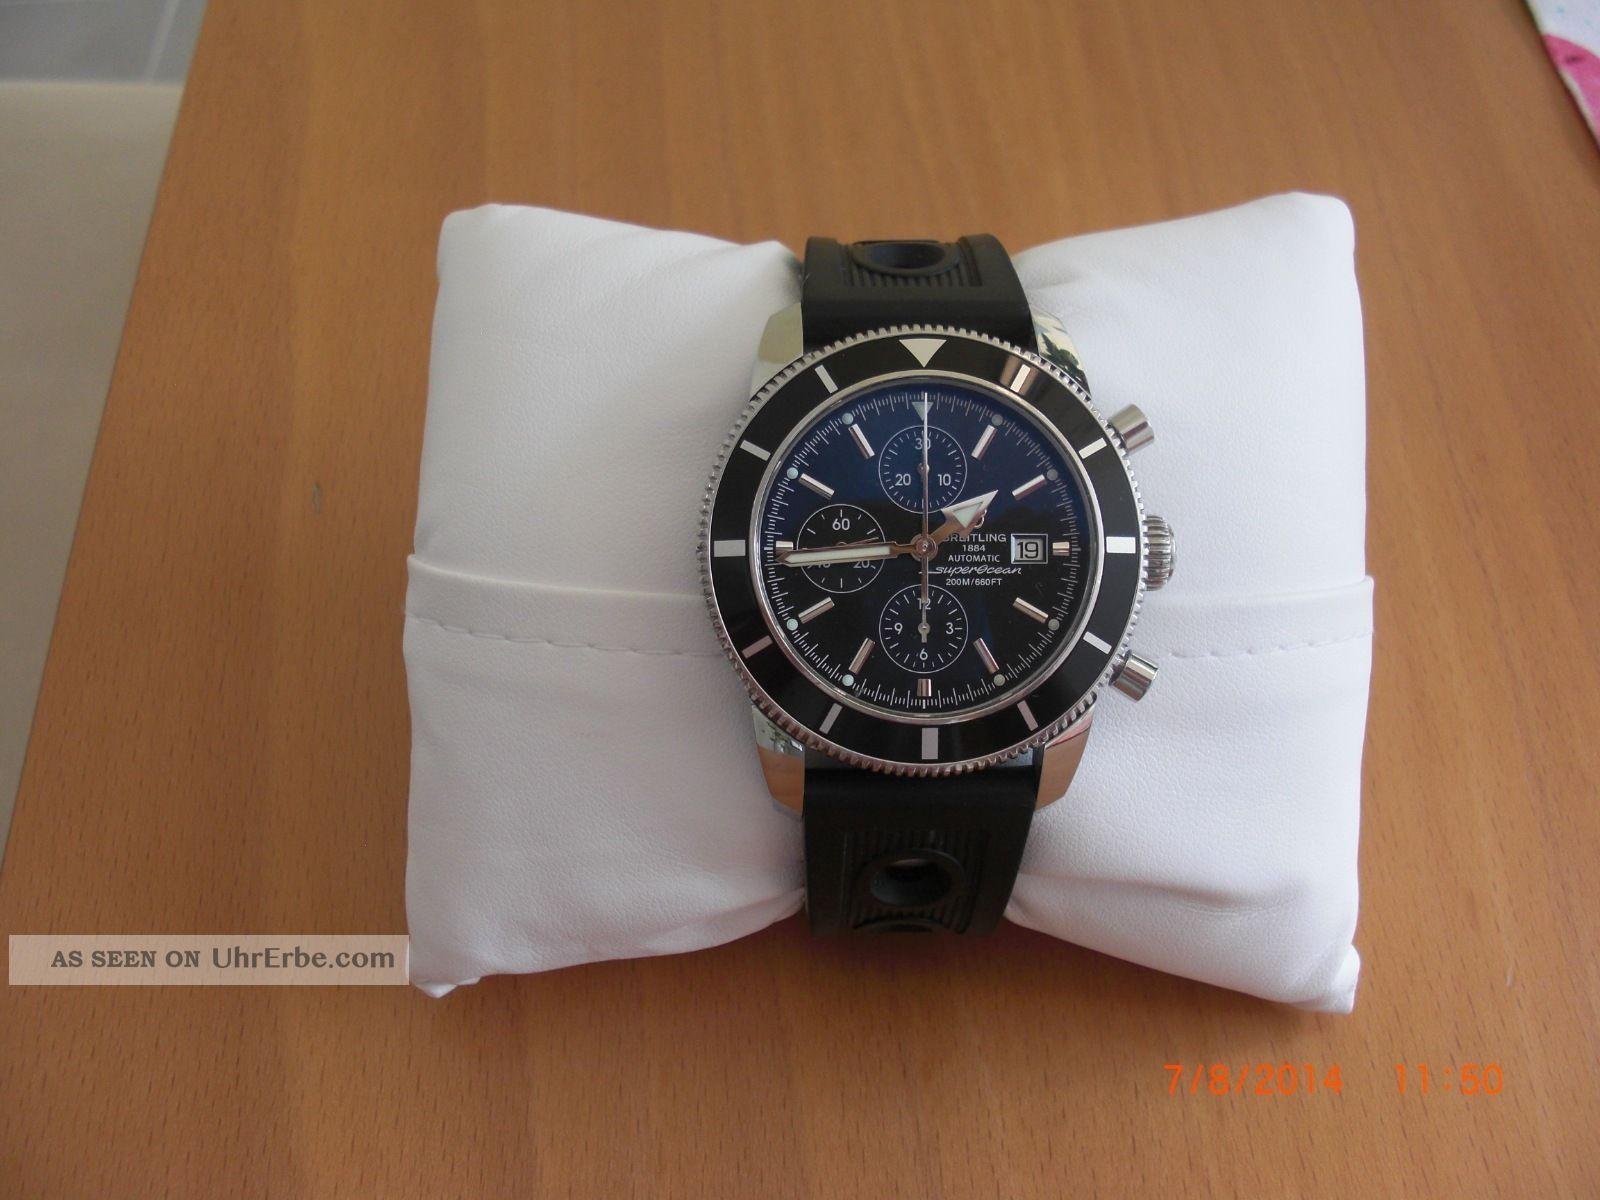 Herrenuhr Breitling Superocean Heritage Chronographe 46 Armbanduhren Bild